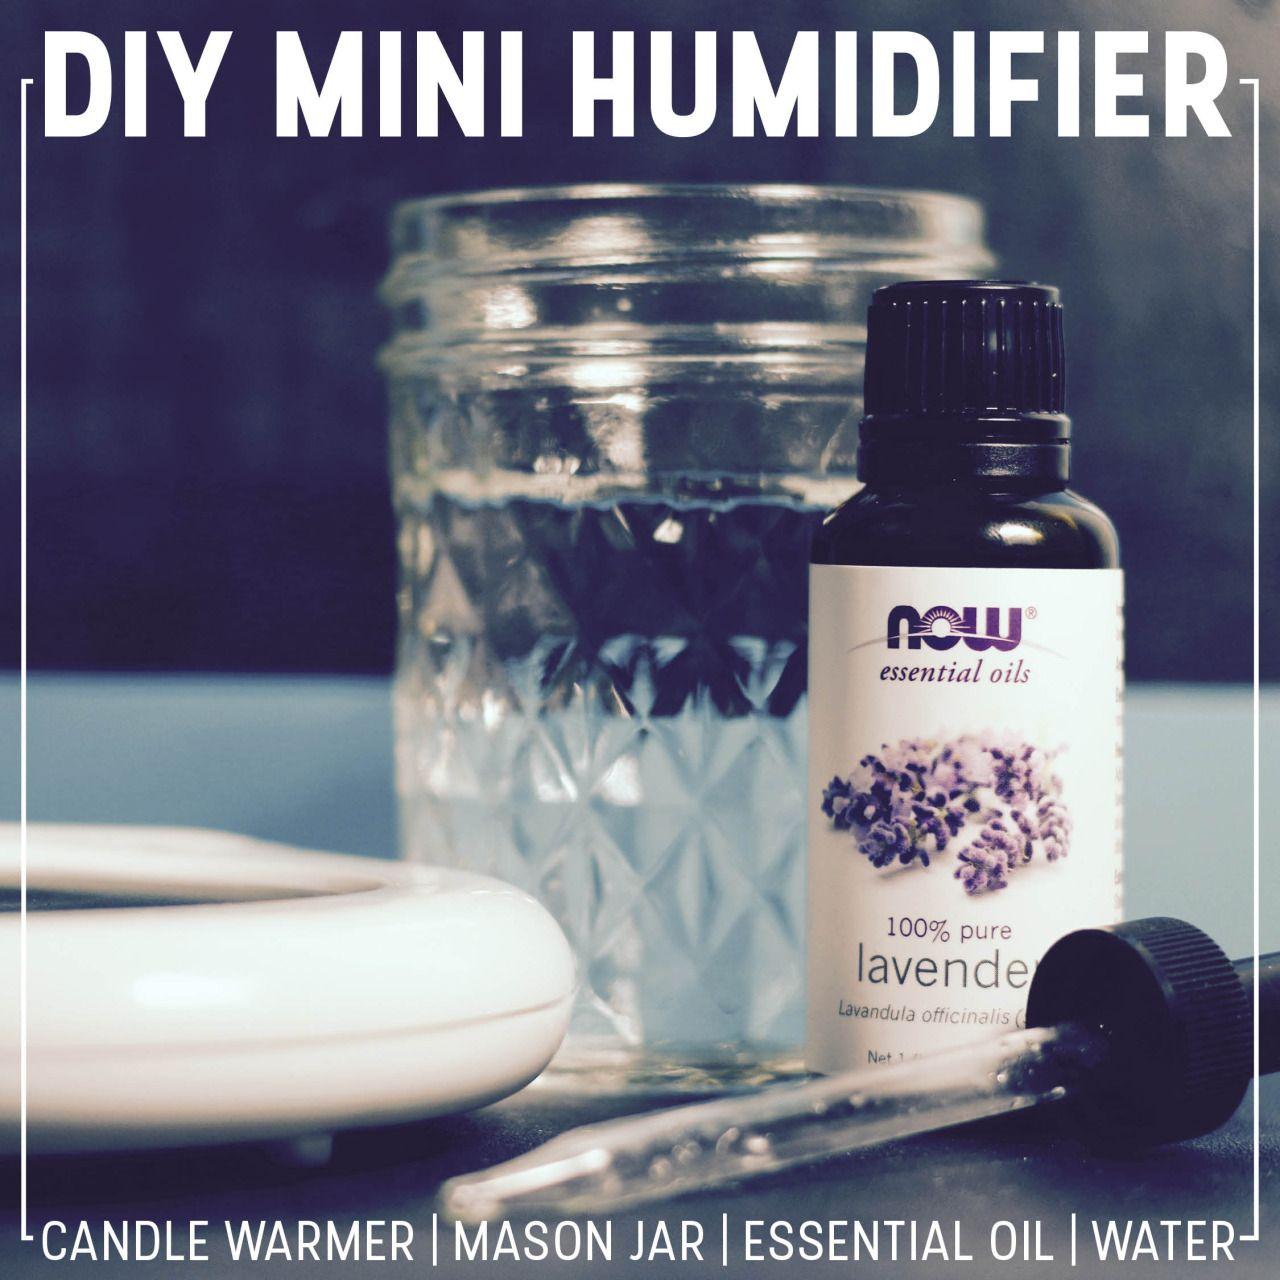 DIY Mini Humidifier Mason jars, Mason jar diy